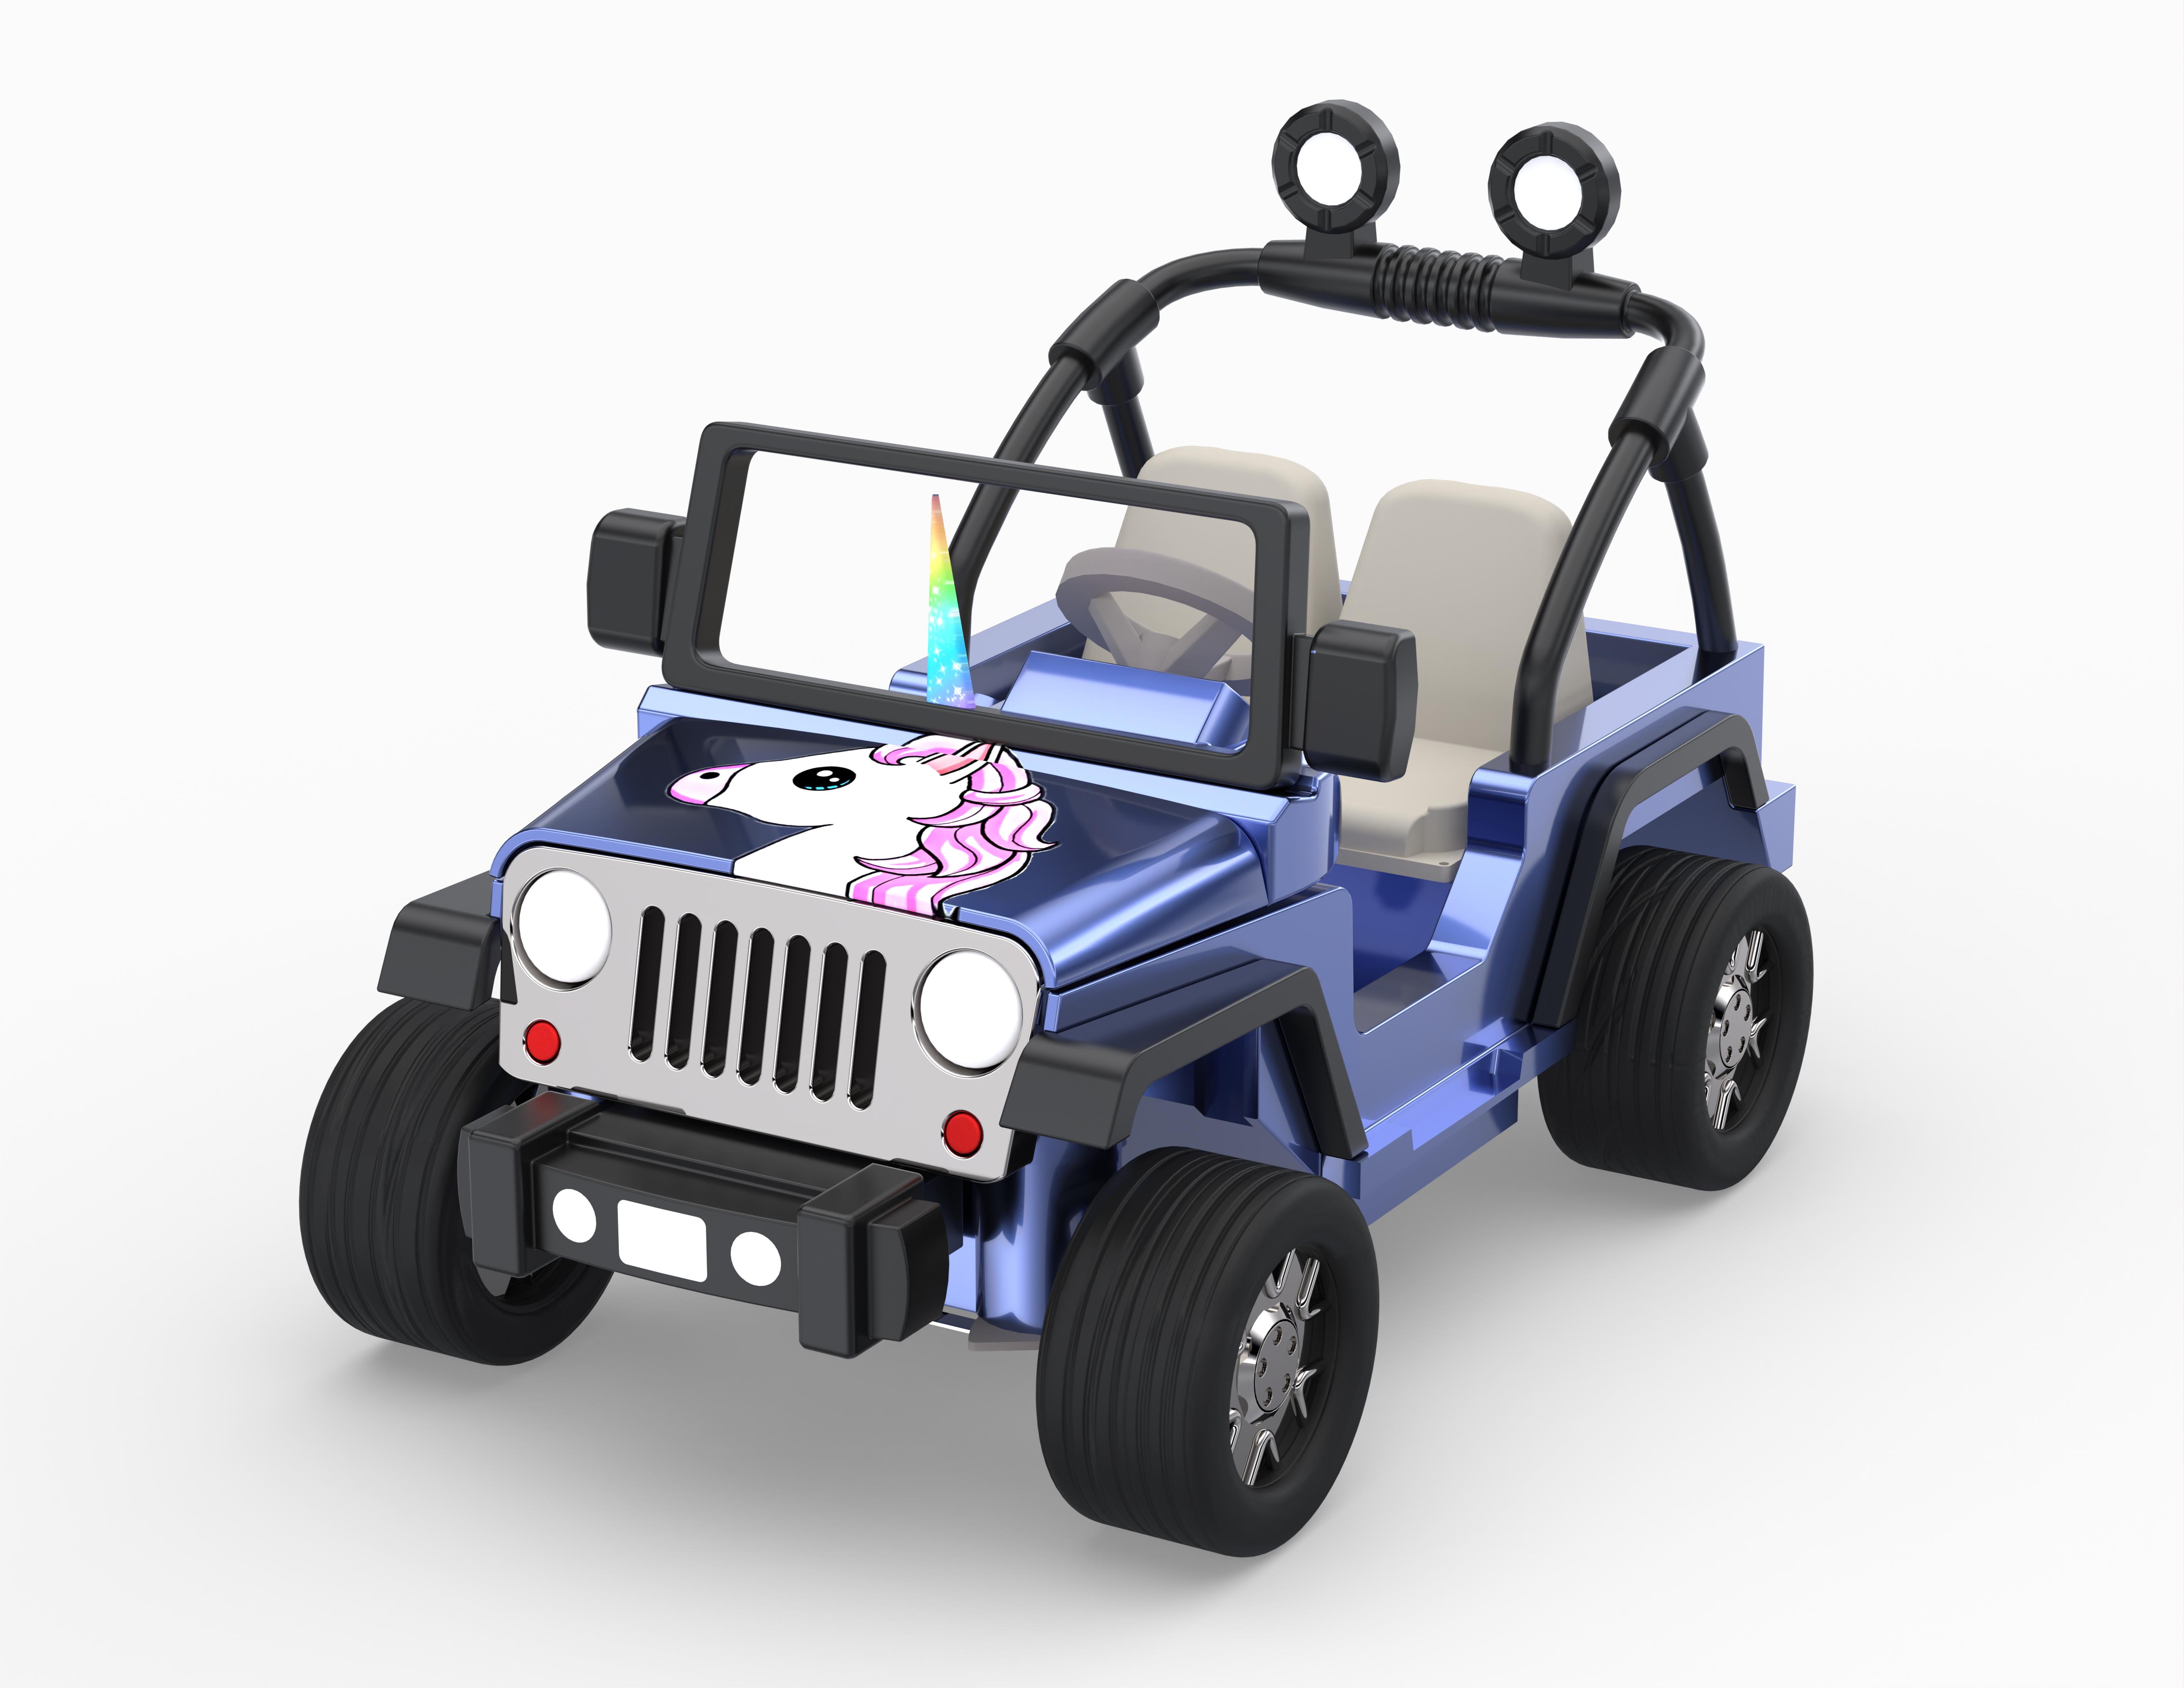 Ride-on Electric Unicorn Car – Part 1